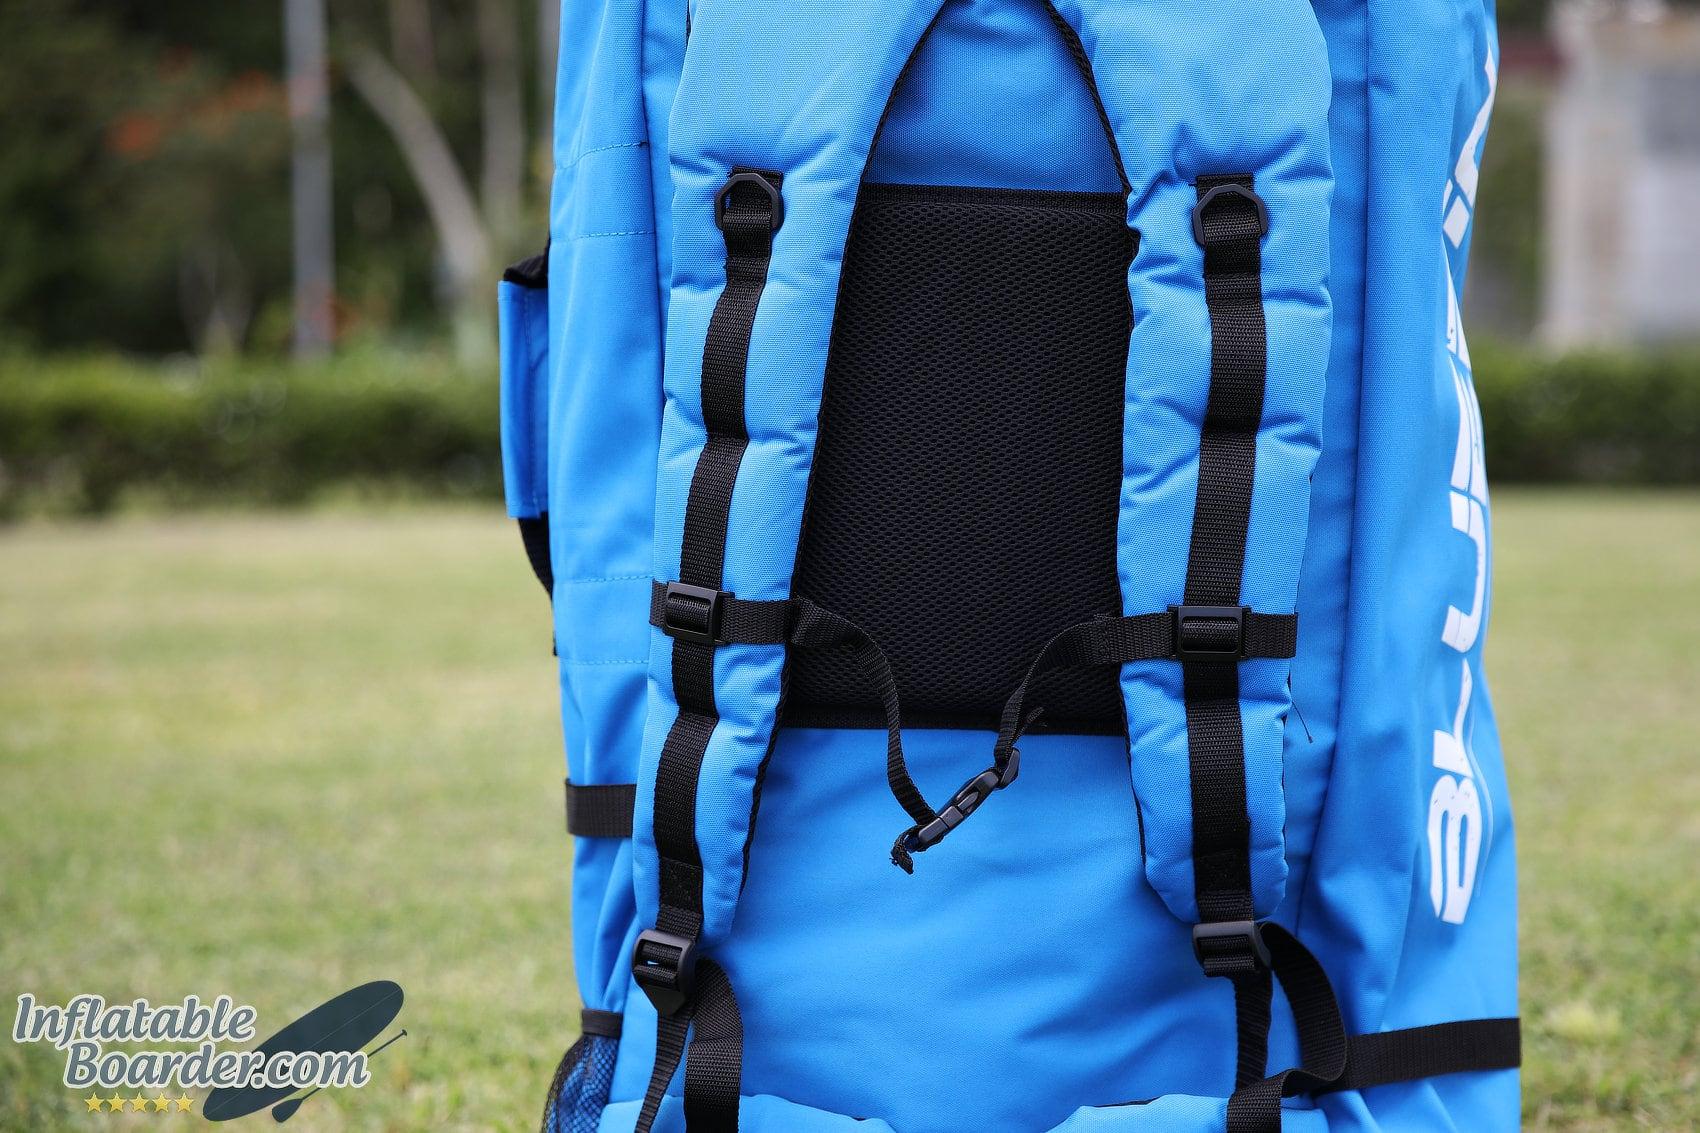 iSUP Travel Bag Straps